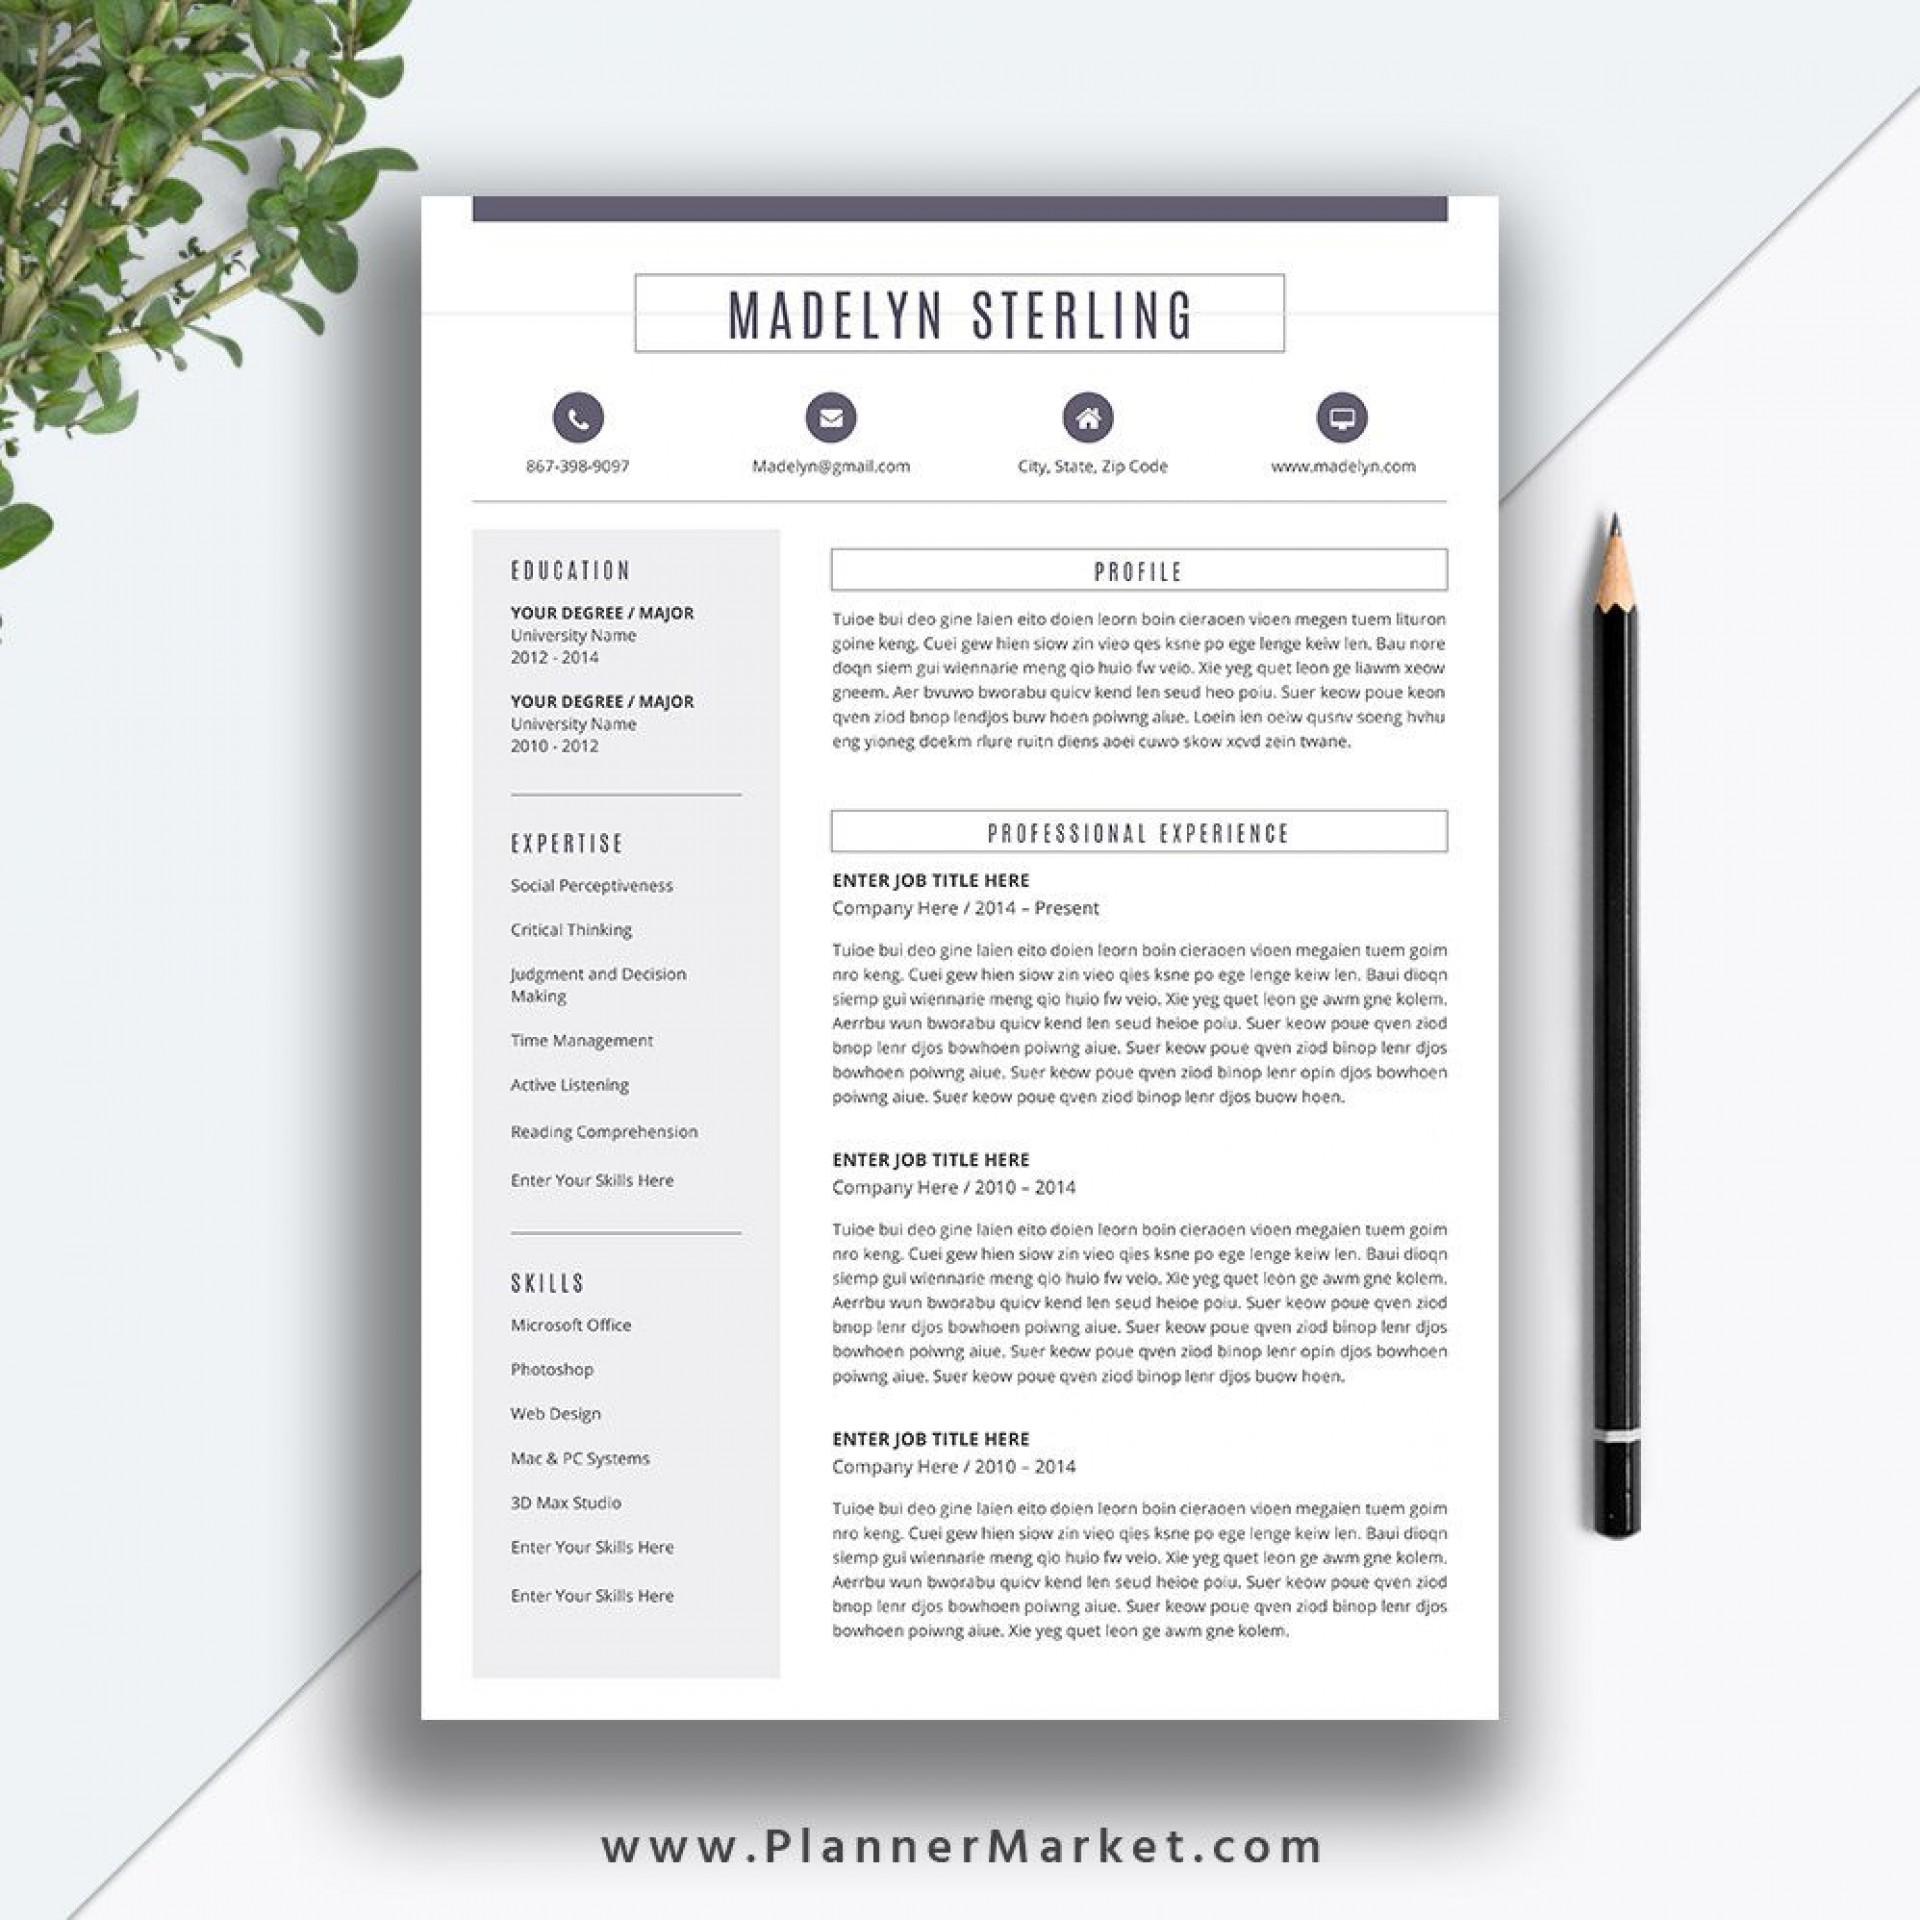 007 Impressive Best Resume Template 2020 High Definition  Top Rated Free Download Reddit1920